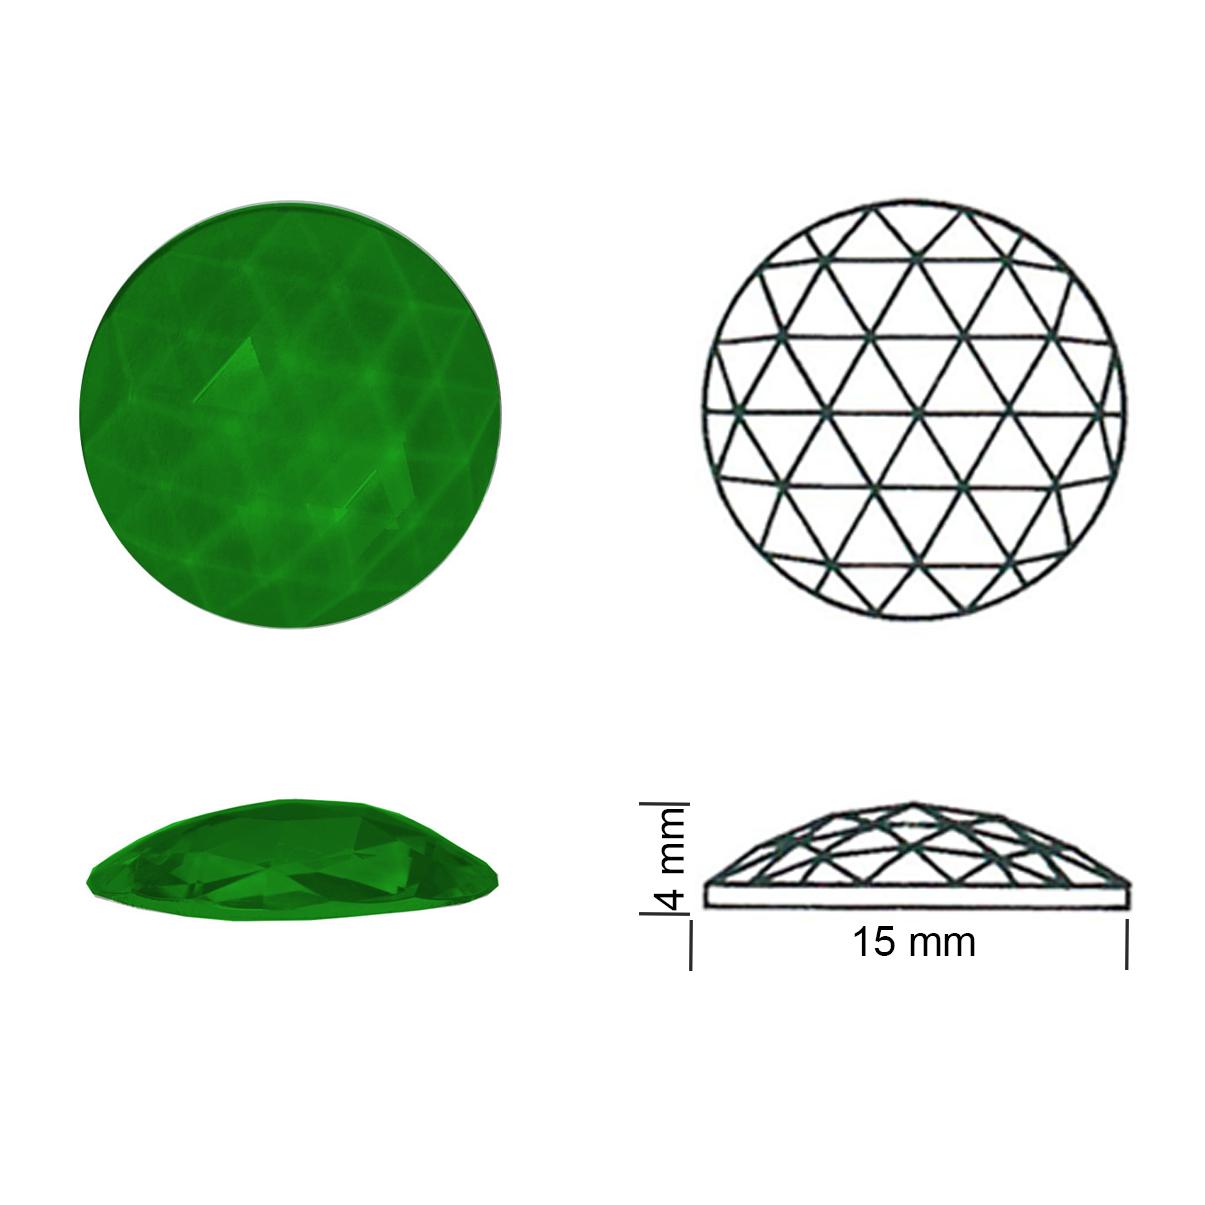 Rautenkreis 15 smaragdgrün